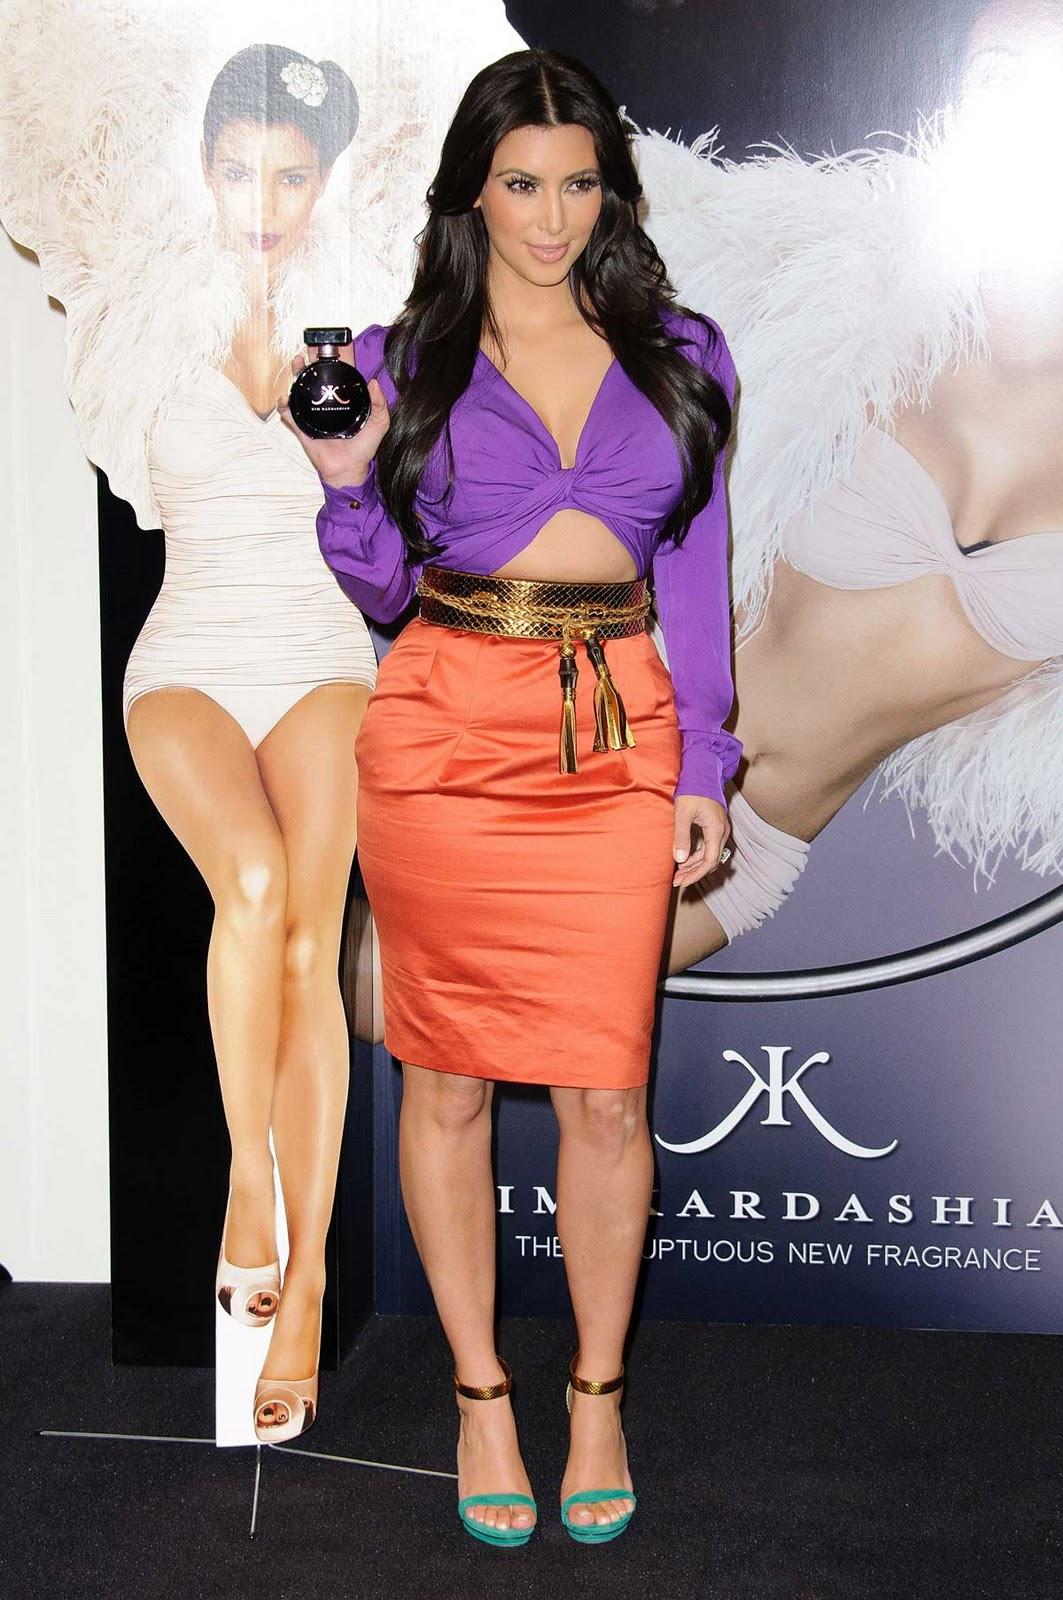 http://1.bp.blogspot.com/-zQCKFhto9Fk/TuOATi67TzI/AAAAAAAABA8/I5xdJ_uCJ_I/s1600/kim_kardashian_purple_4.jpg